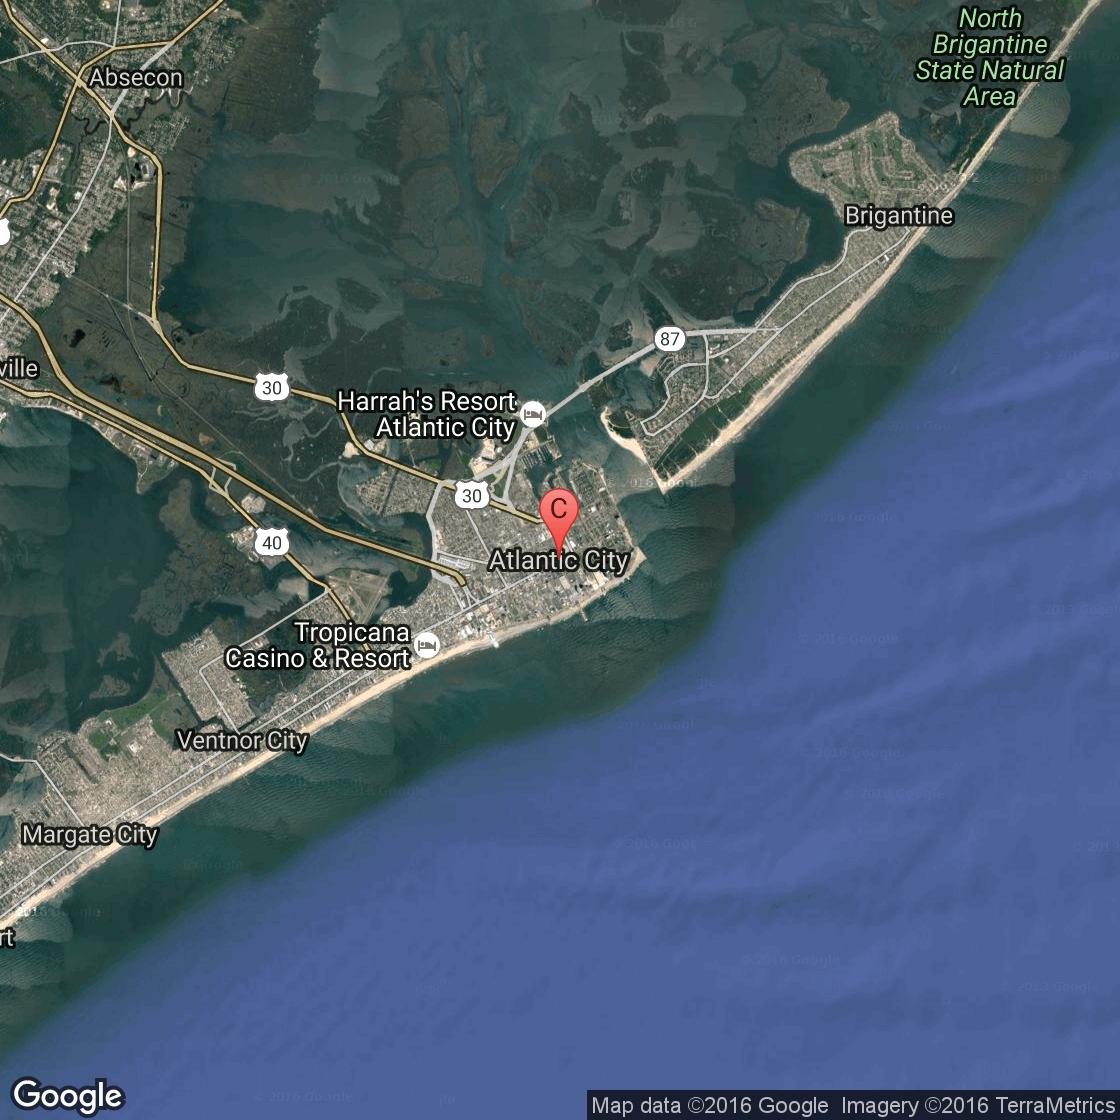 Hotels In Atlantic City >> Hotels Near Atlantic City Casinos Usa Today